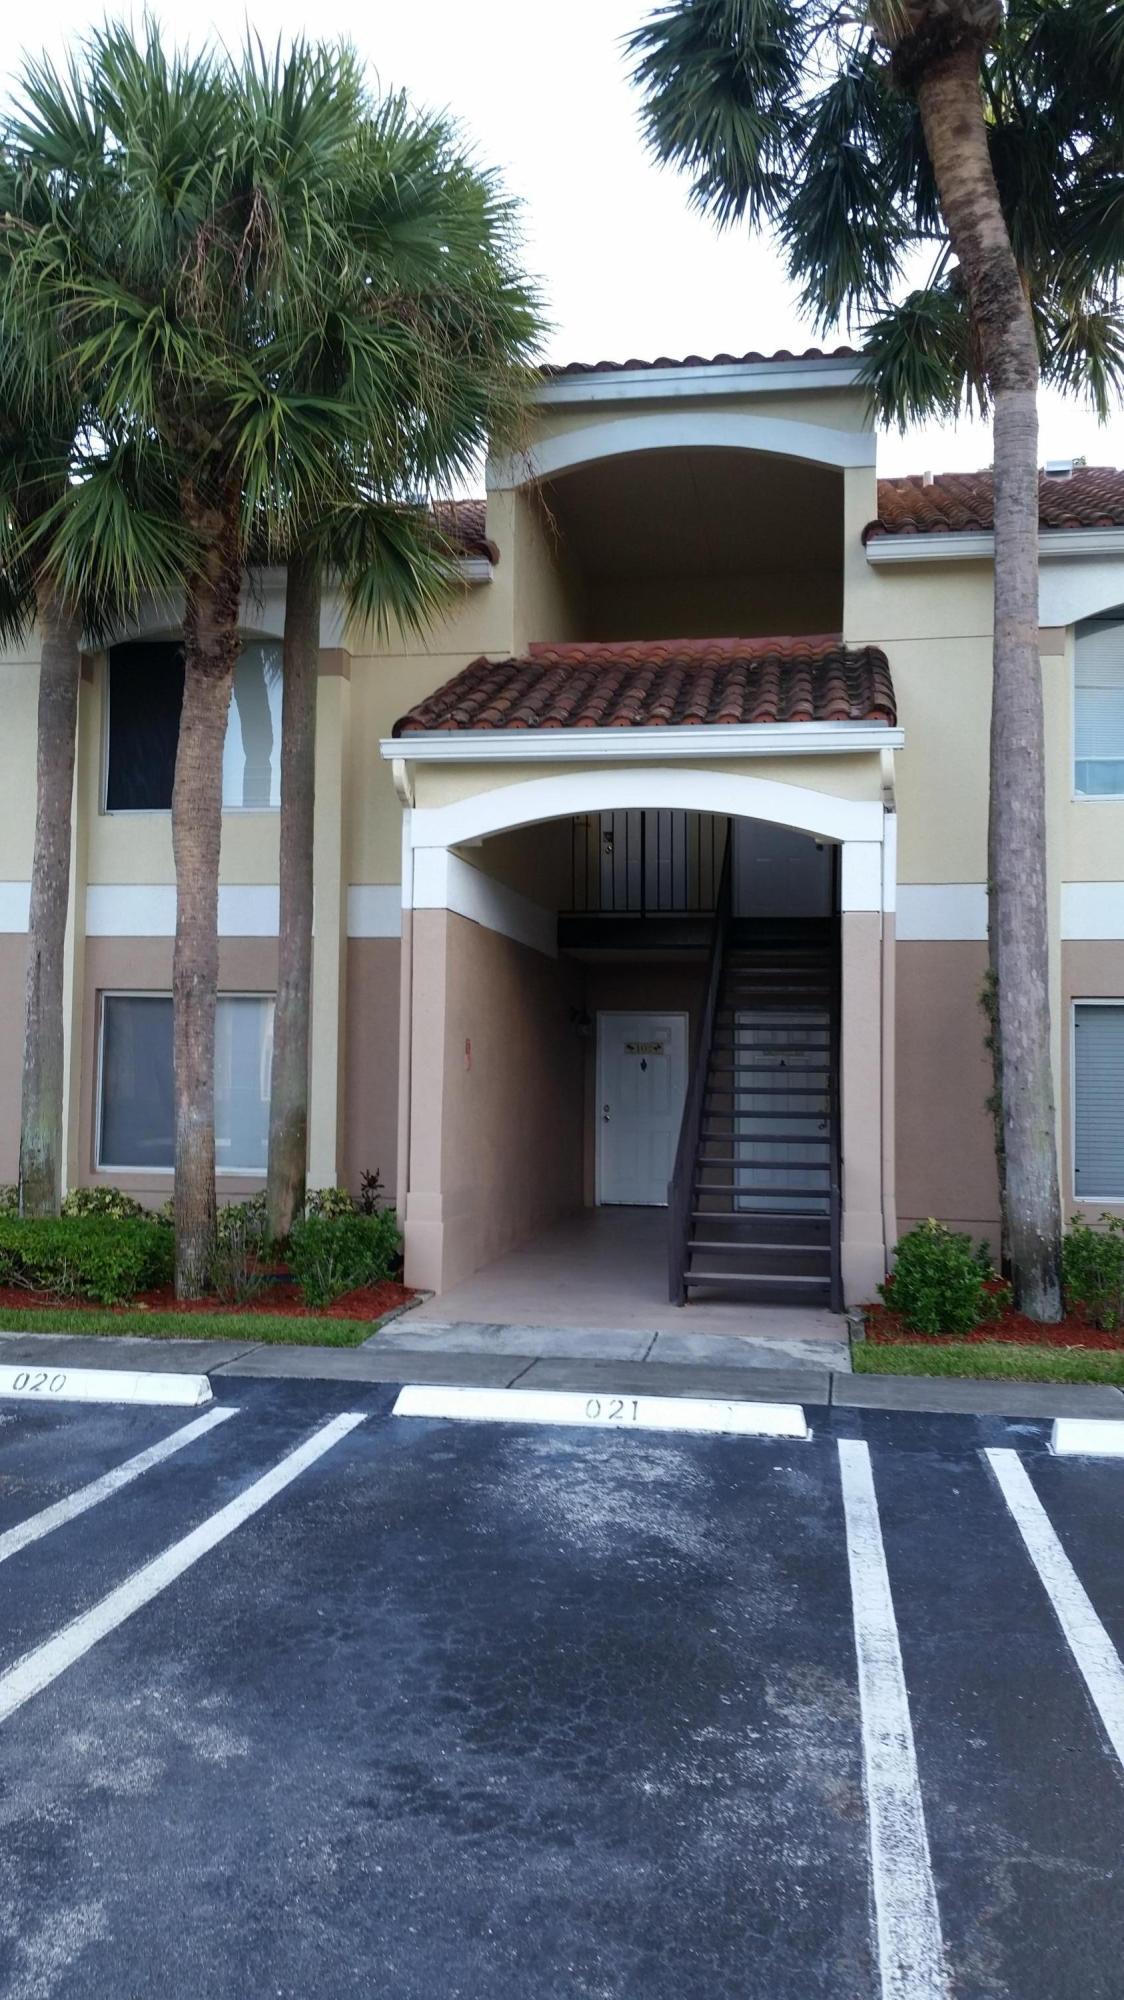 815 W Boynton Beach Boulevard 2-102 Boynton Beach, FL 33426